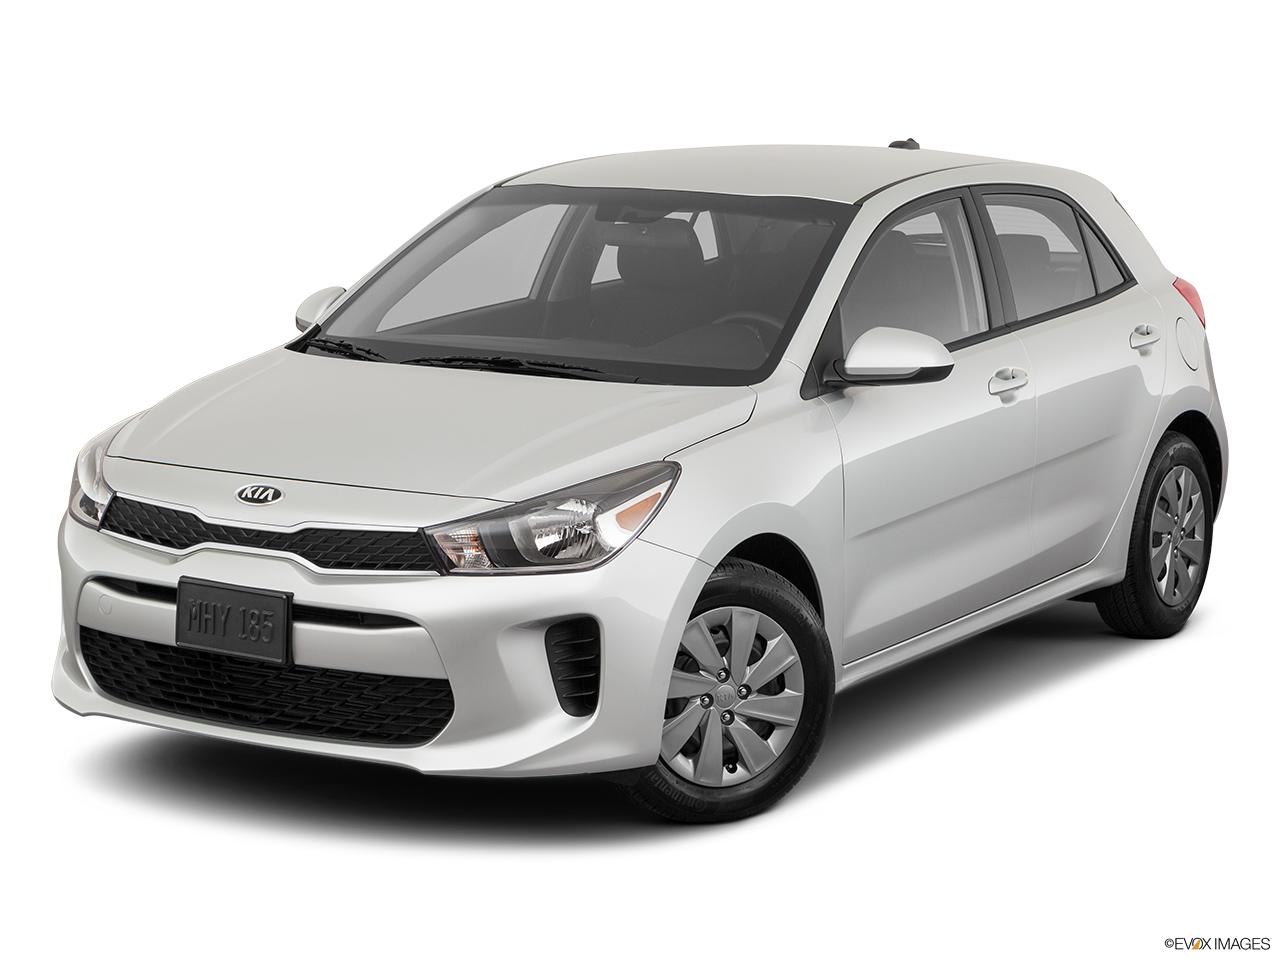 Kia Rio Hatchback 2020 1 4l Mpi In Uae New Car Prices Specs